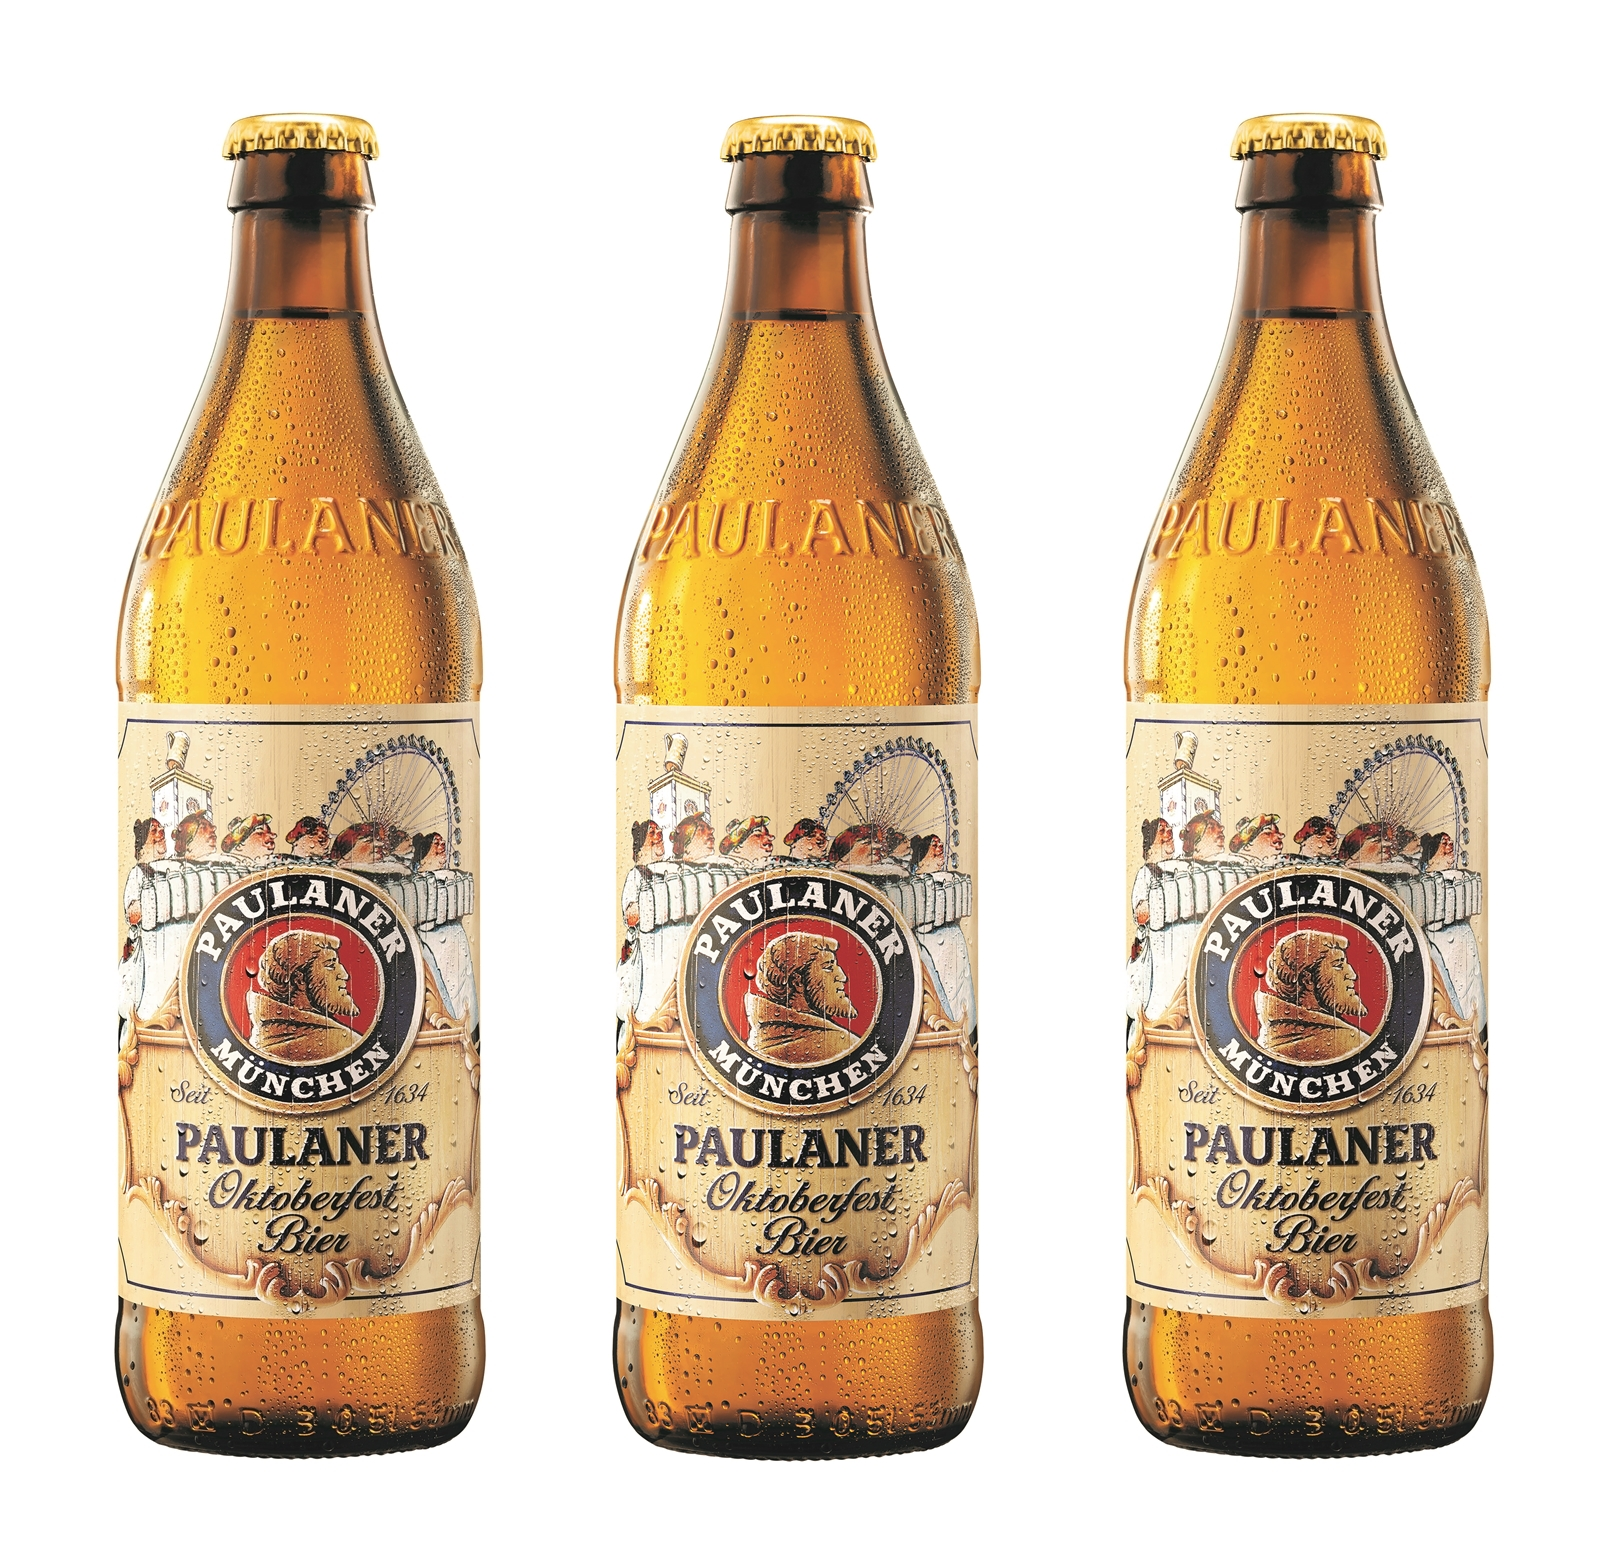 PAULANER Oktoberfest Bier 2020